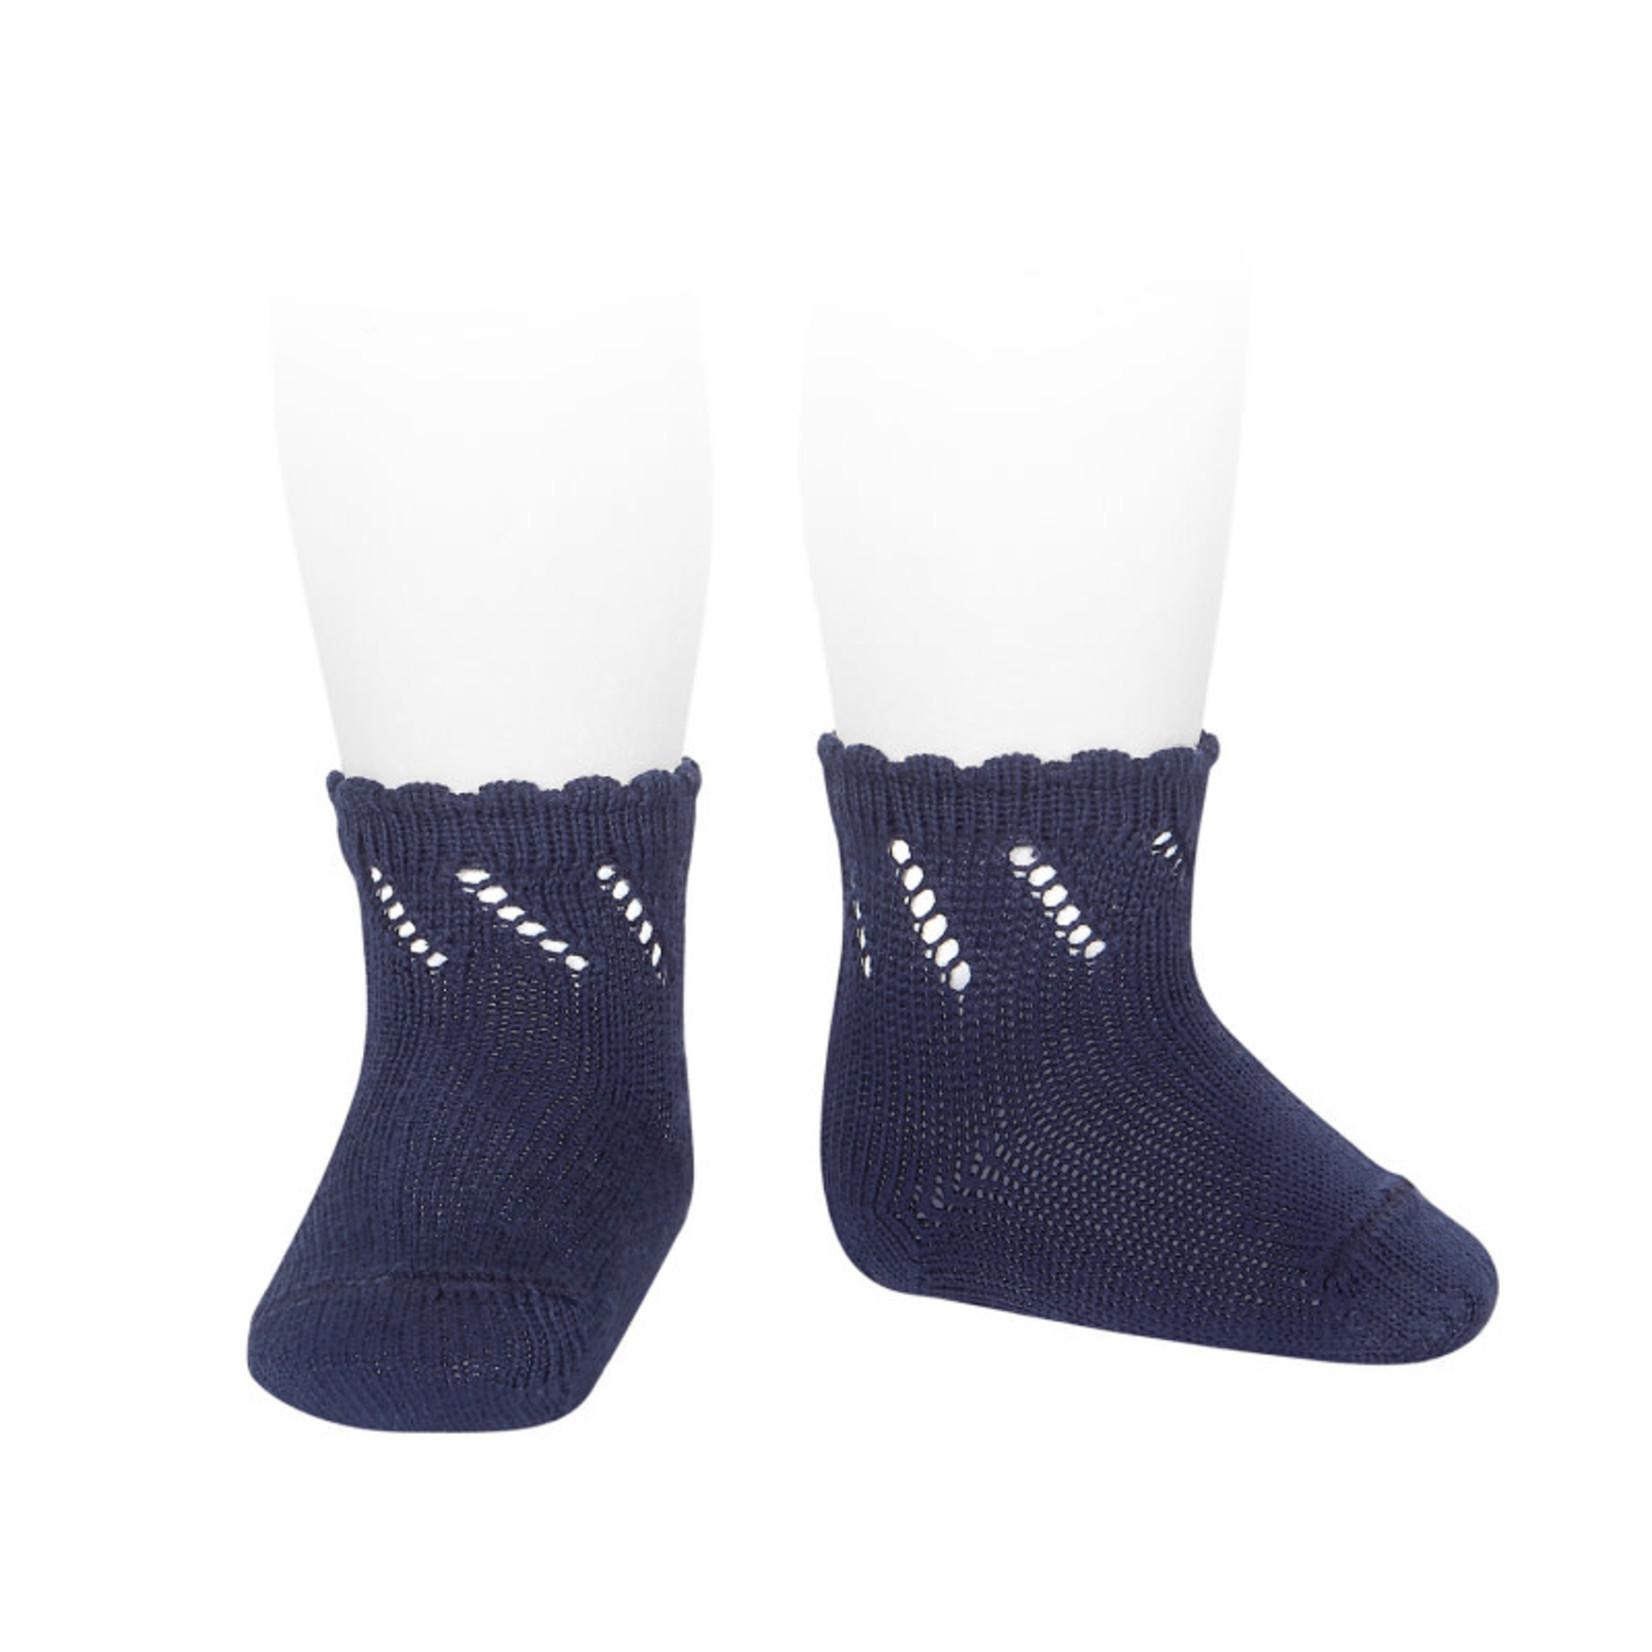 Condor Newborn Socks - Navy